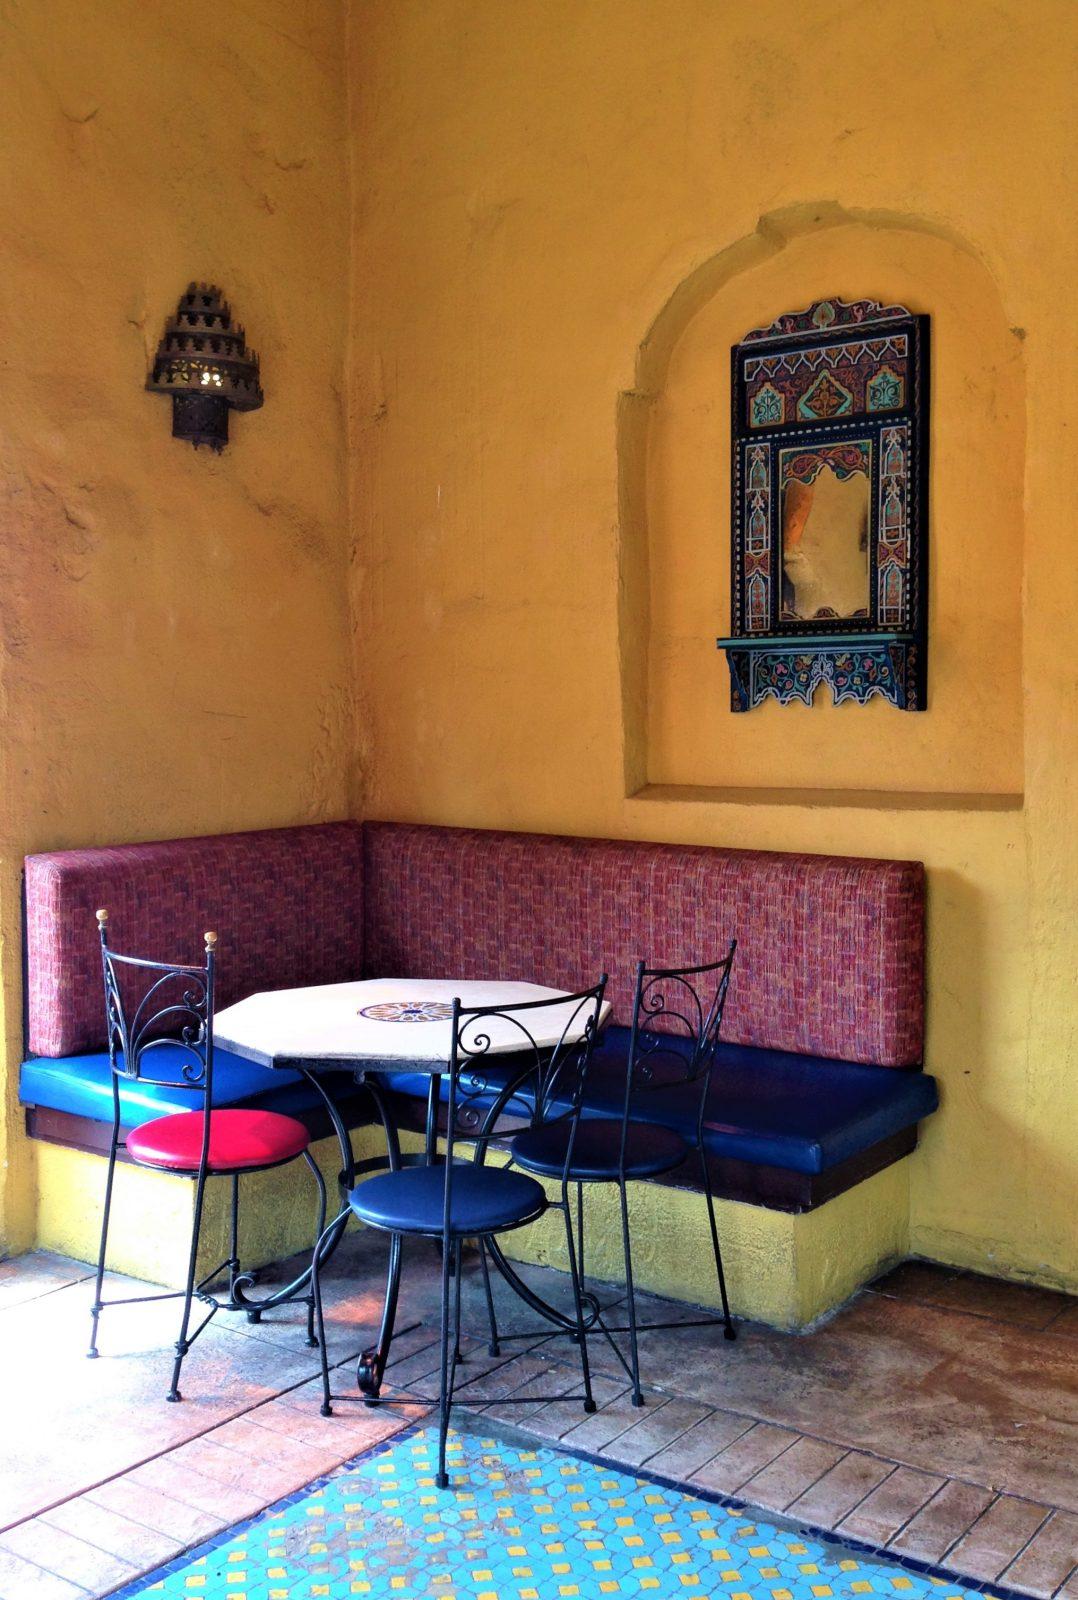 Tangierine Cafe